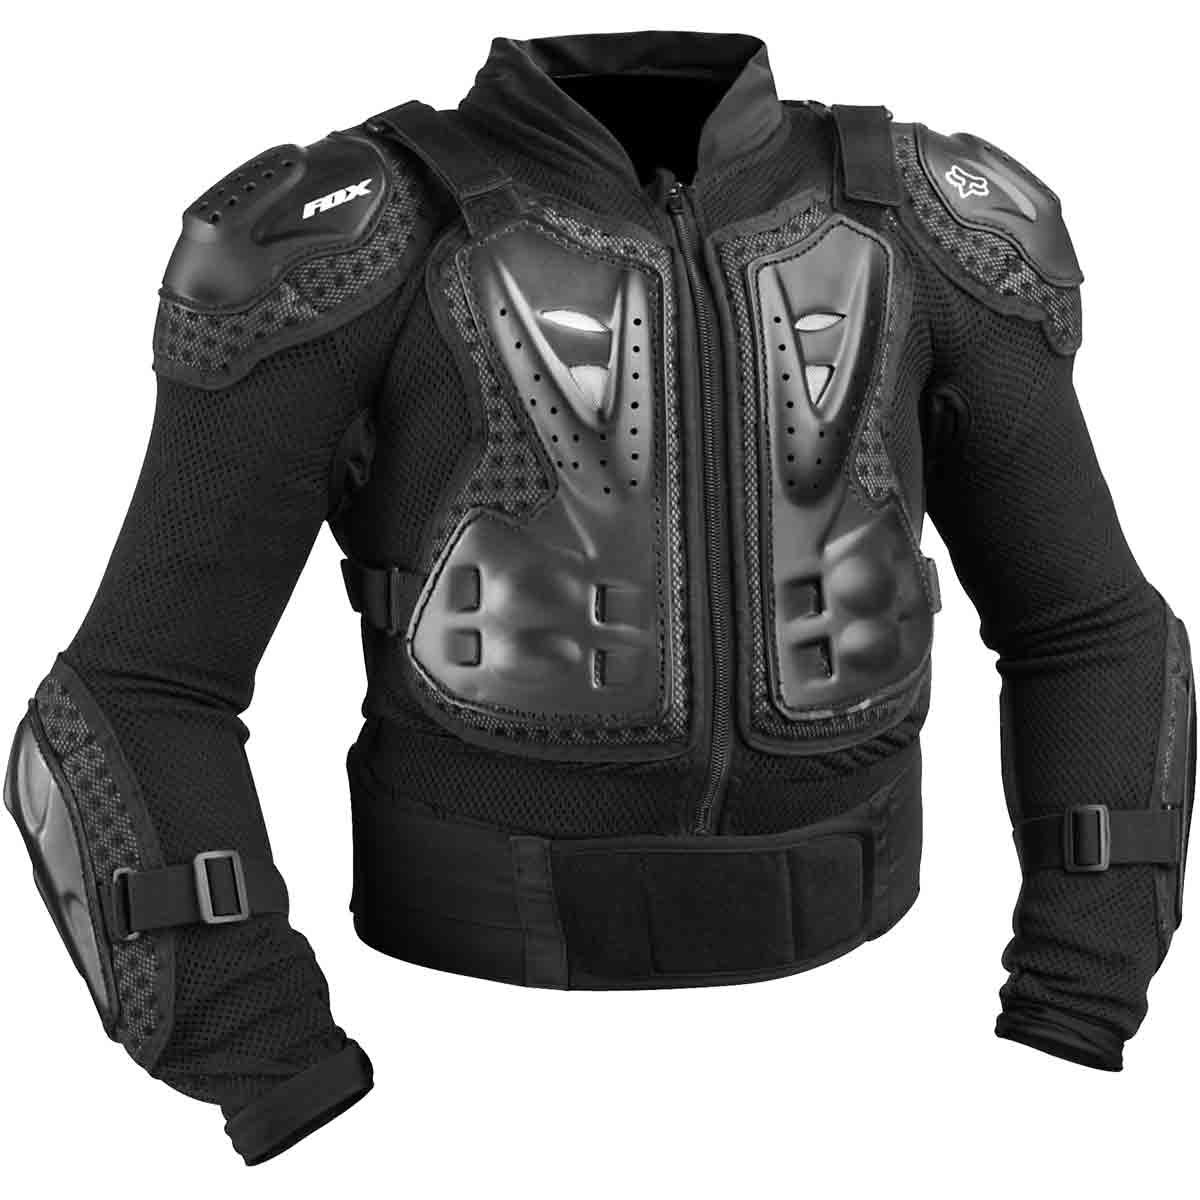 Fox Racing Titan Sport Jacket Youth Boys Roost Deflector MotoX Motorcycle Body Armor - Black / One Size